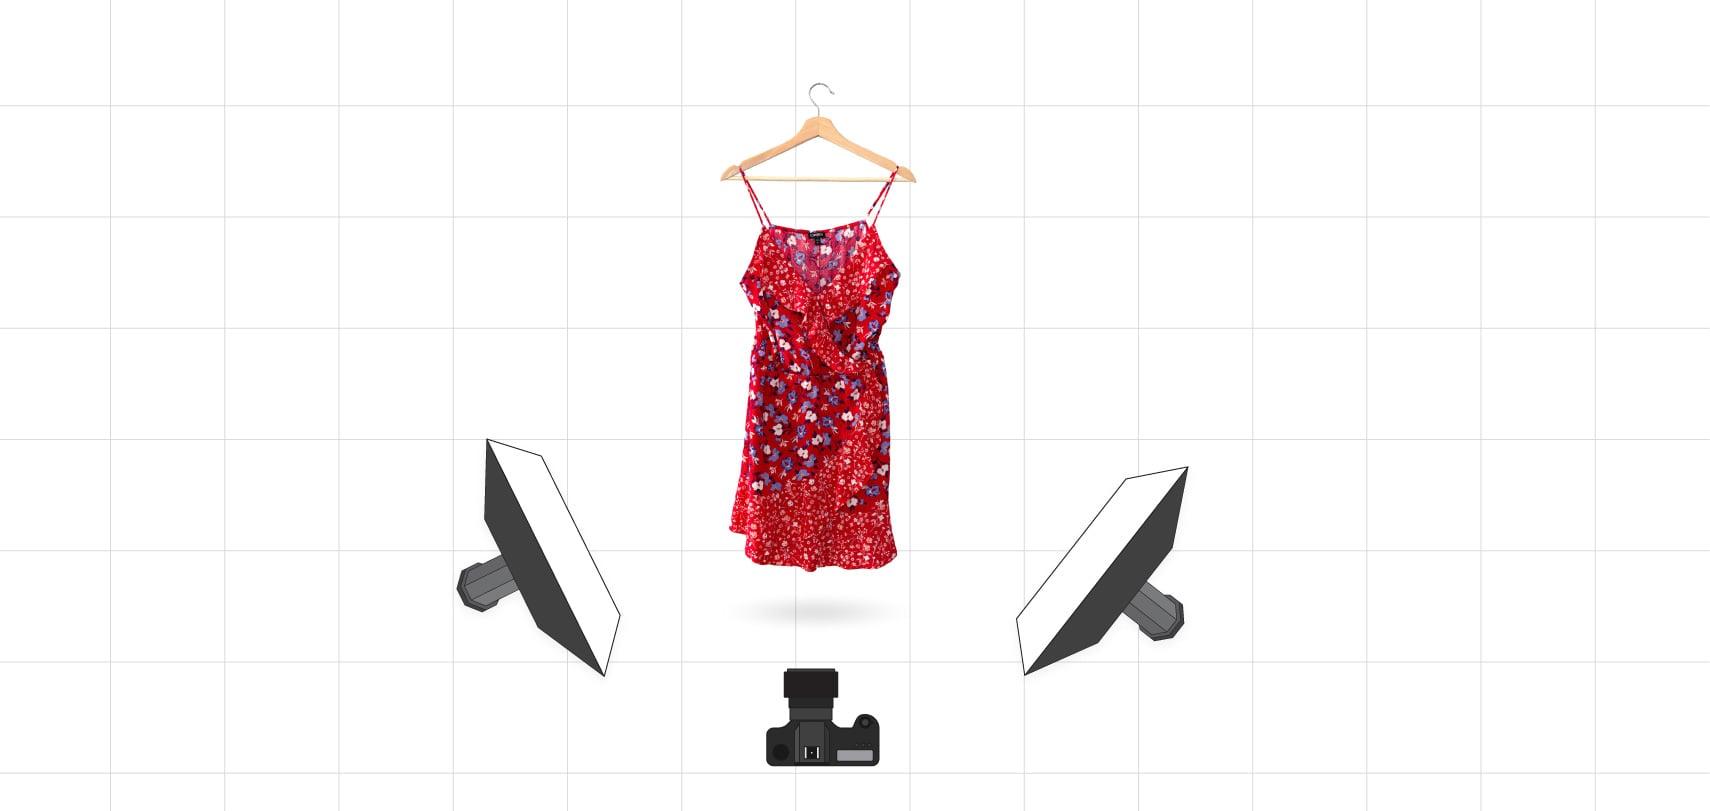 Our lighting setup for a dress on a hanger